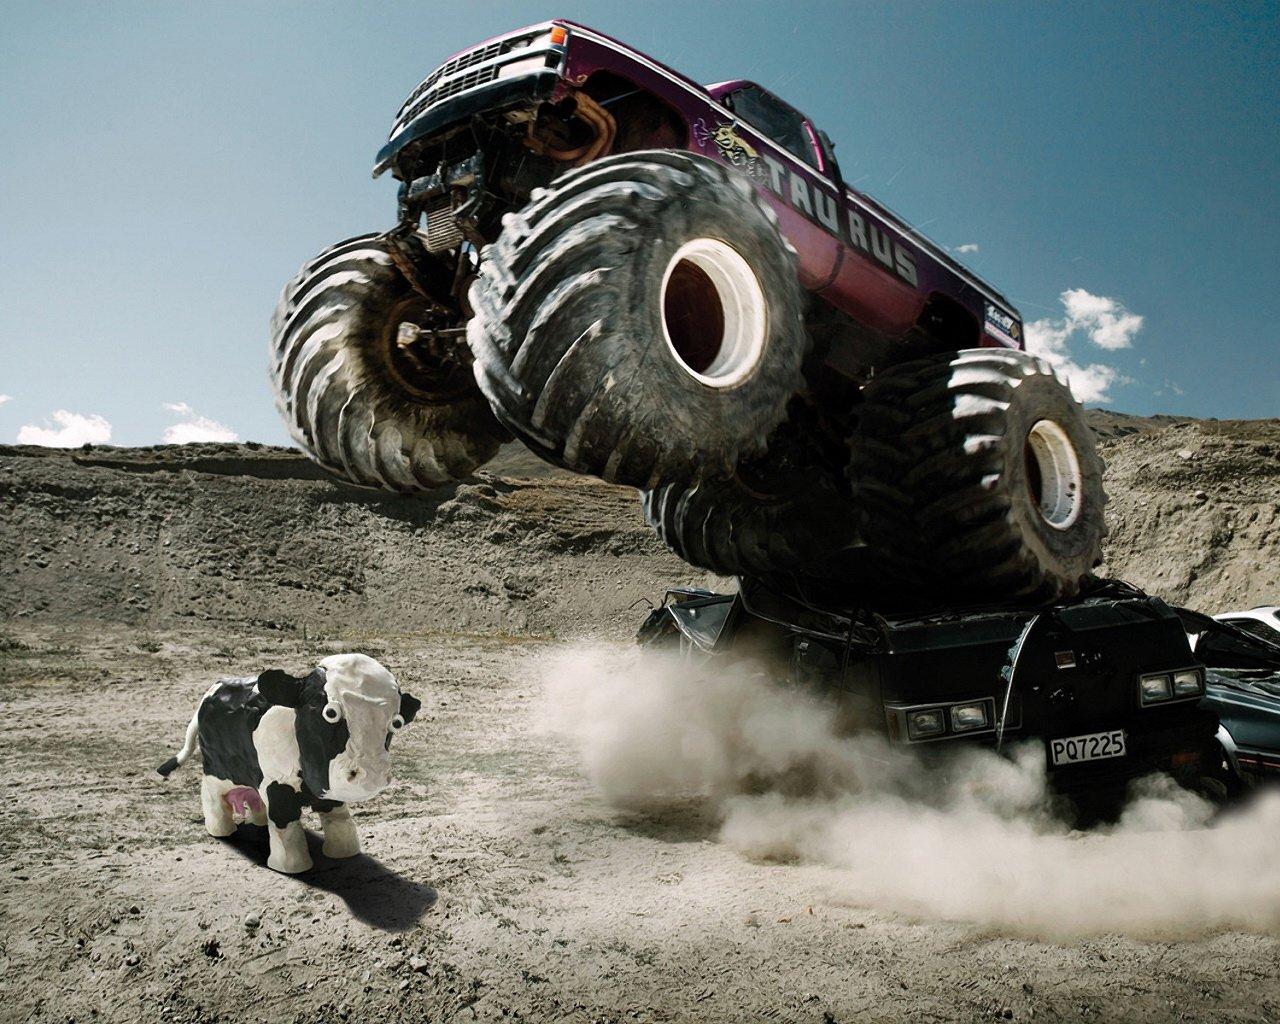 General 1280x1024 cow monster trucks vehicle car trucks numbers